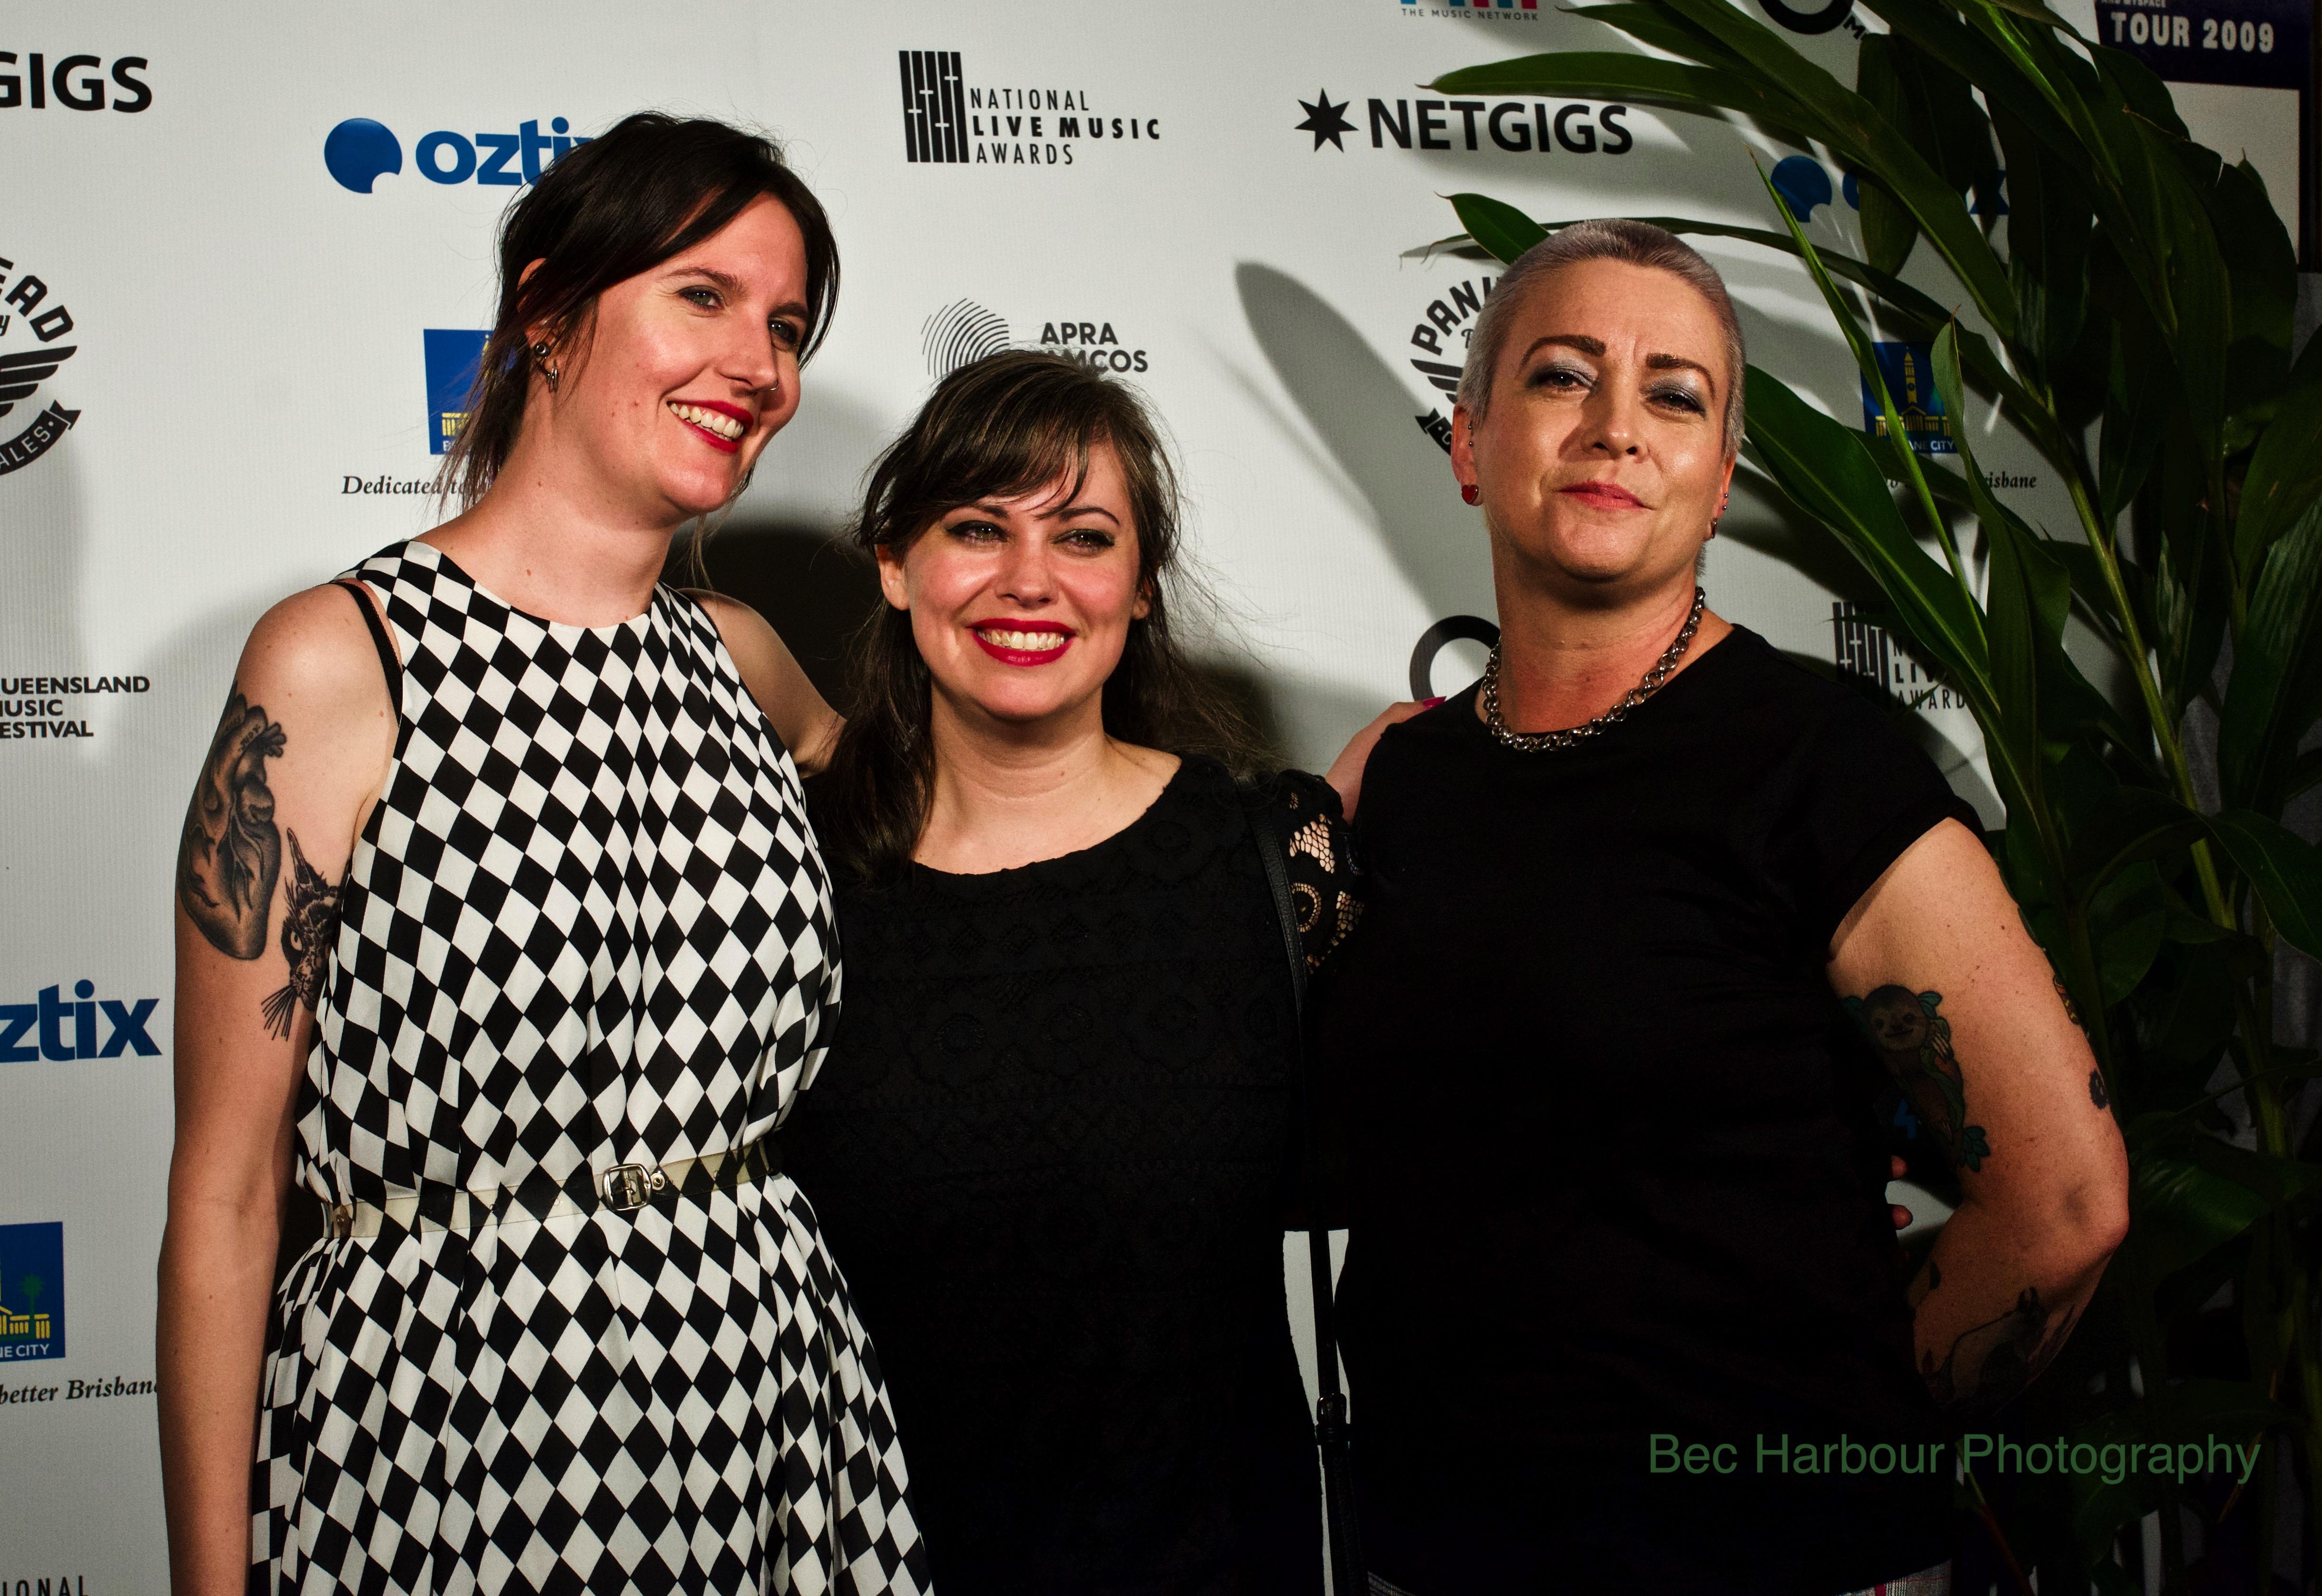 Girls Rock! Australia - winners The NLMA - Photo Bec Harbour